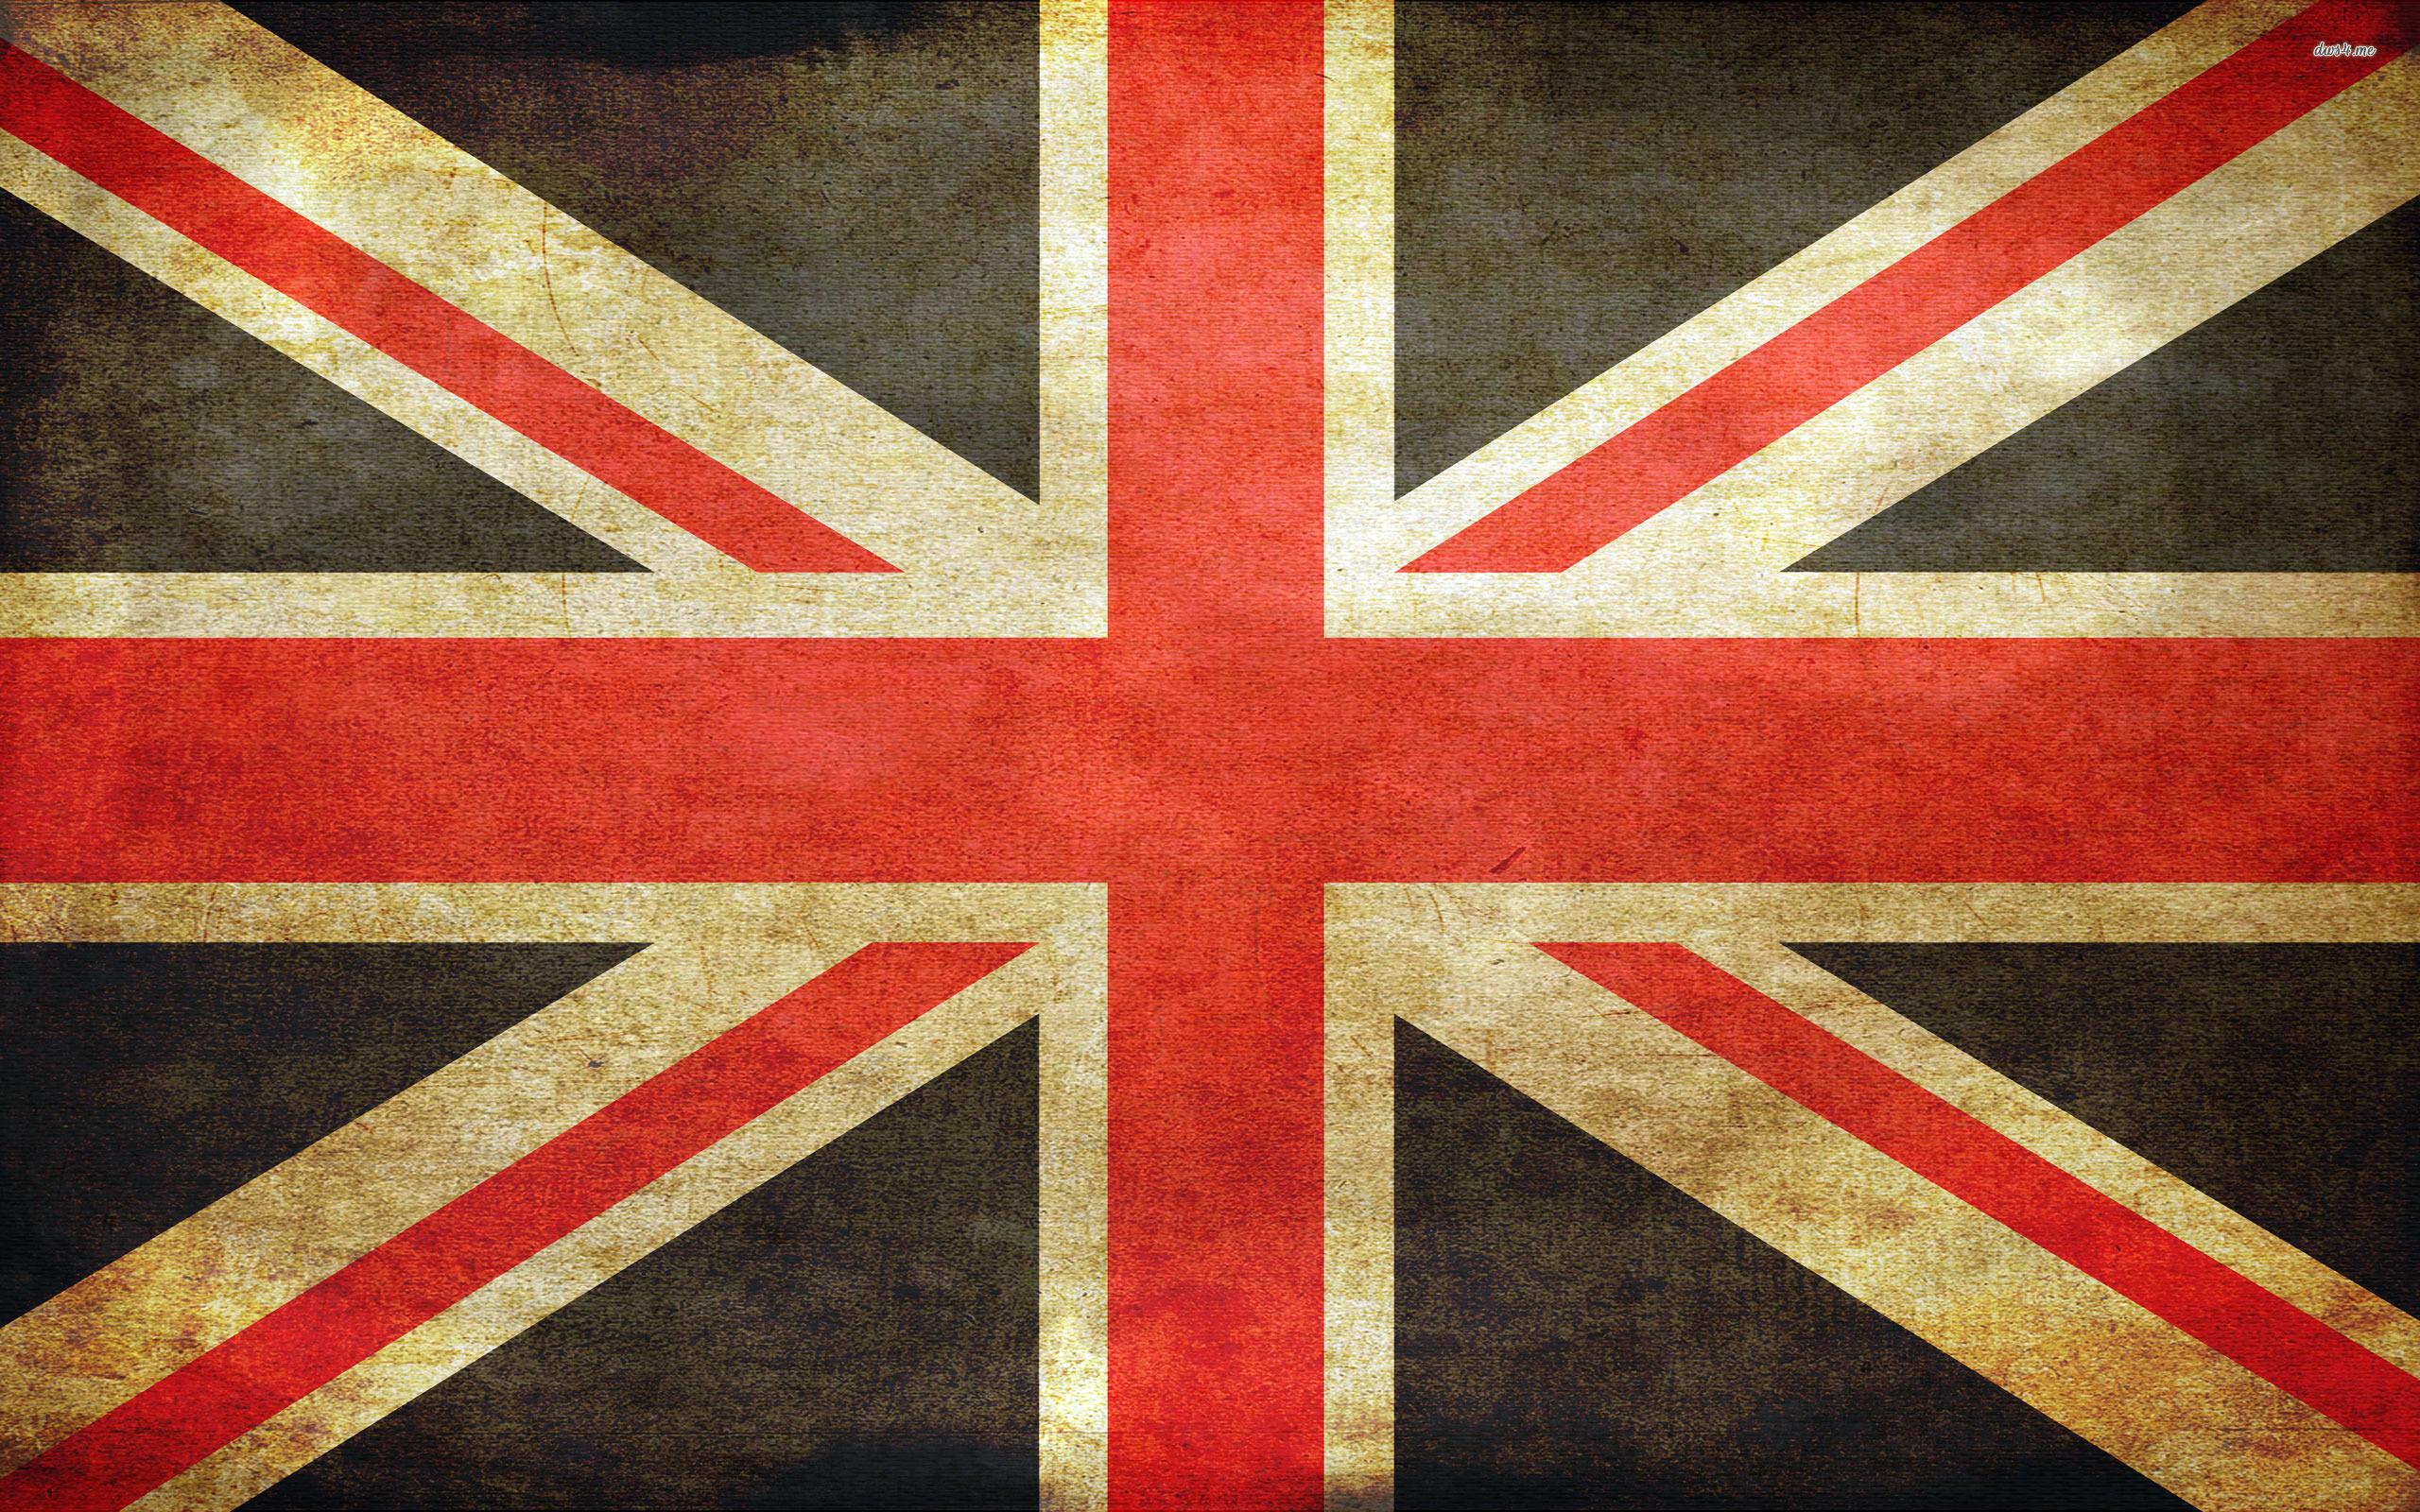 united kingdom flag united kingdom flag united kingdom flag united 2560x1600